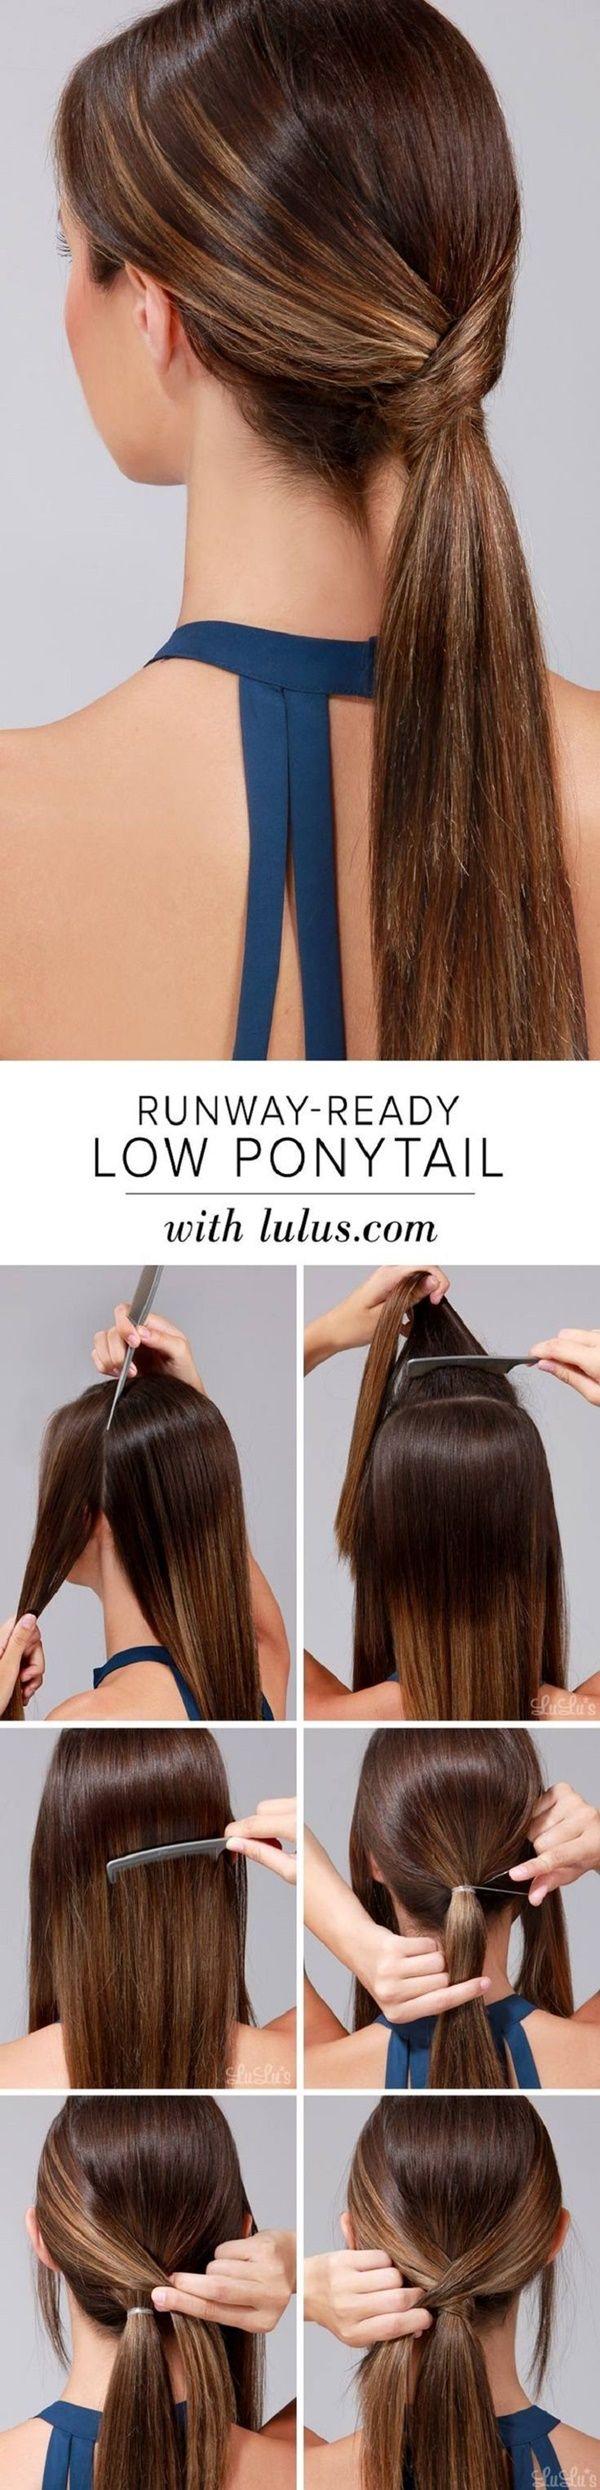 Tremendous 1000 Ideas About Easy School Hairstyles On Pinterest School Short Hairstyles Gunalazisus